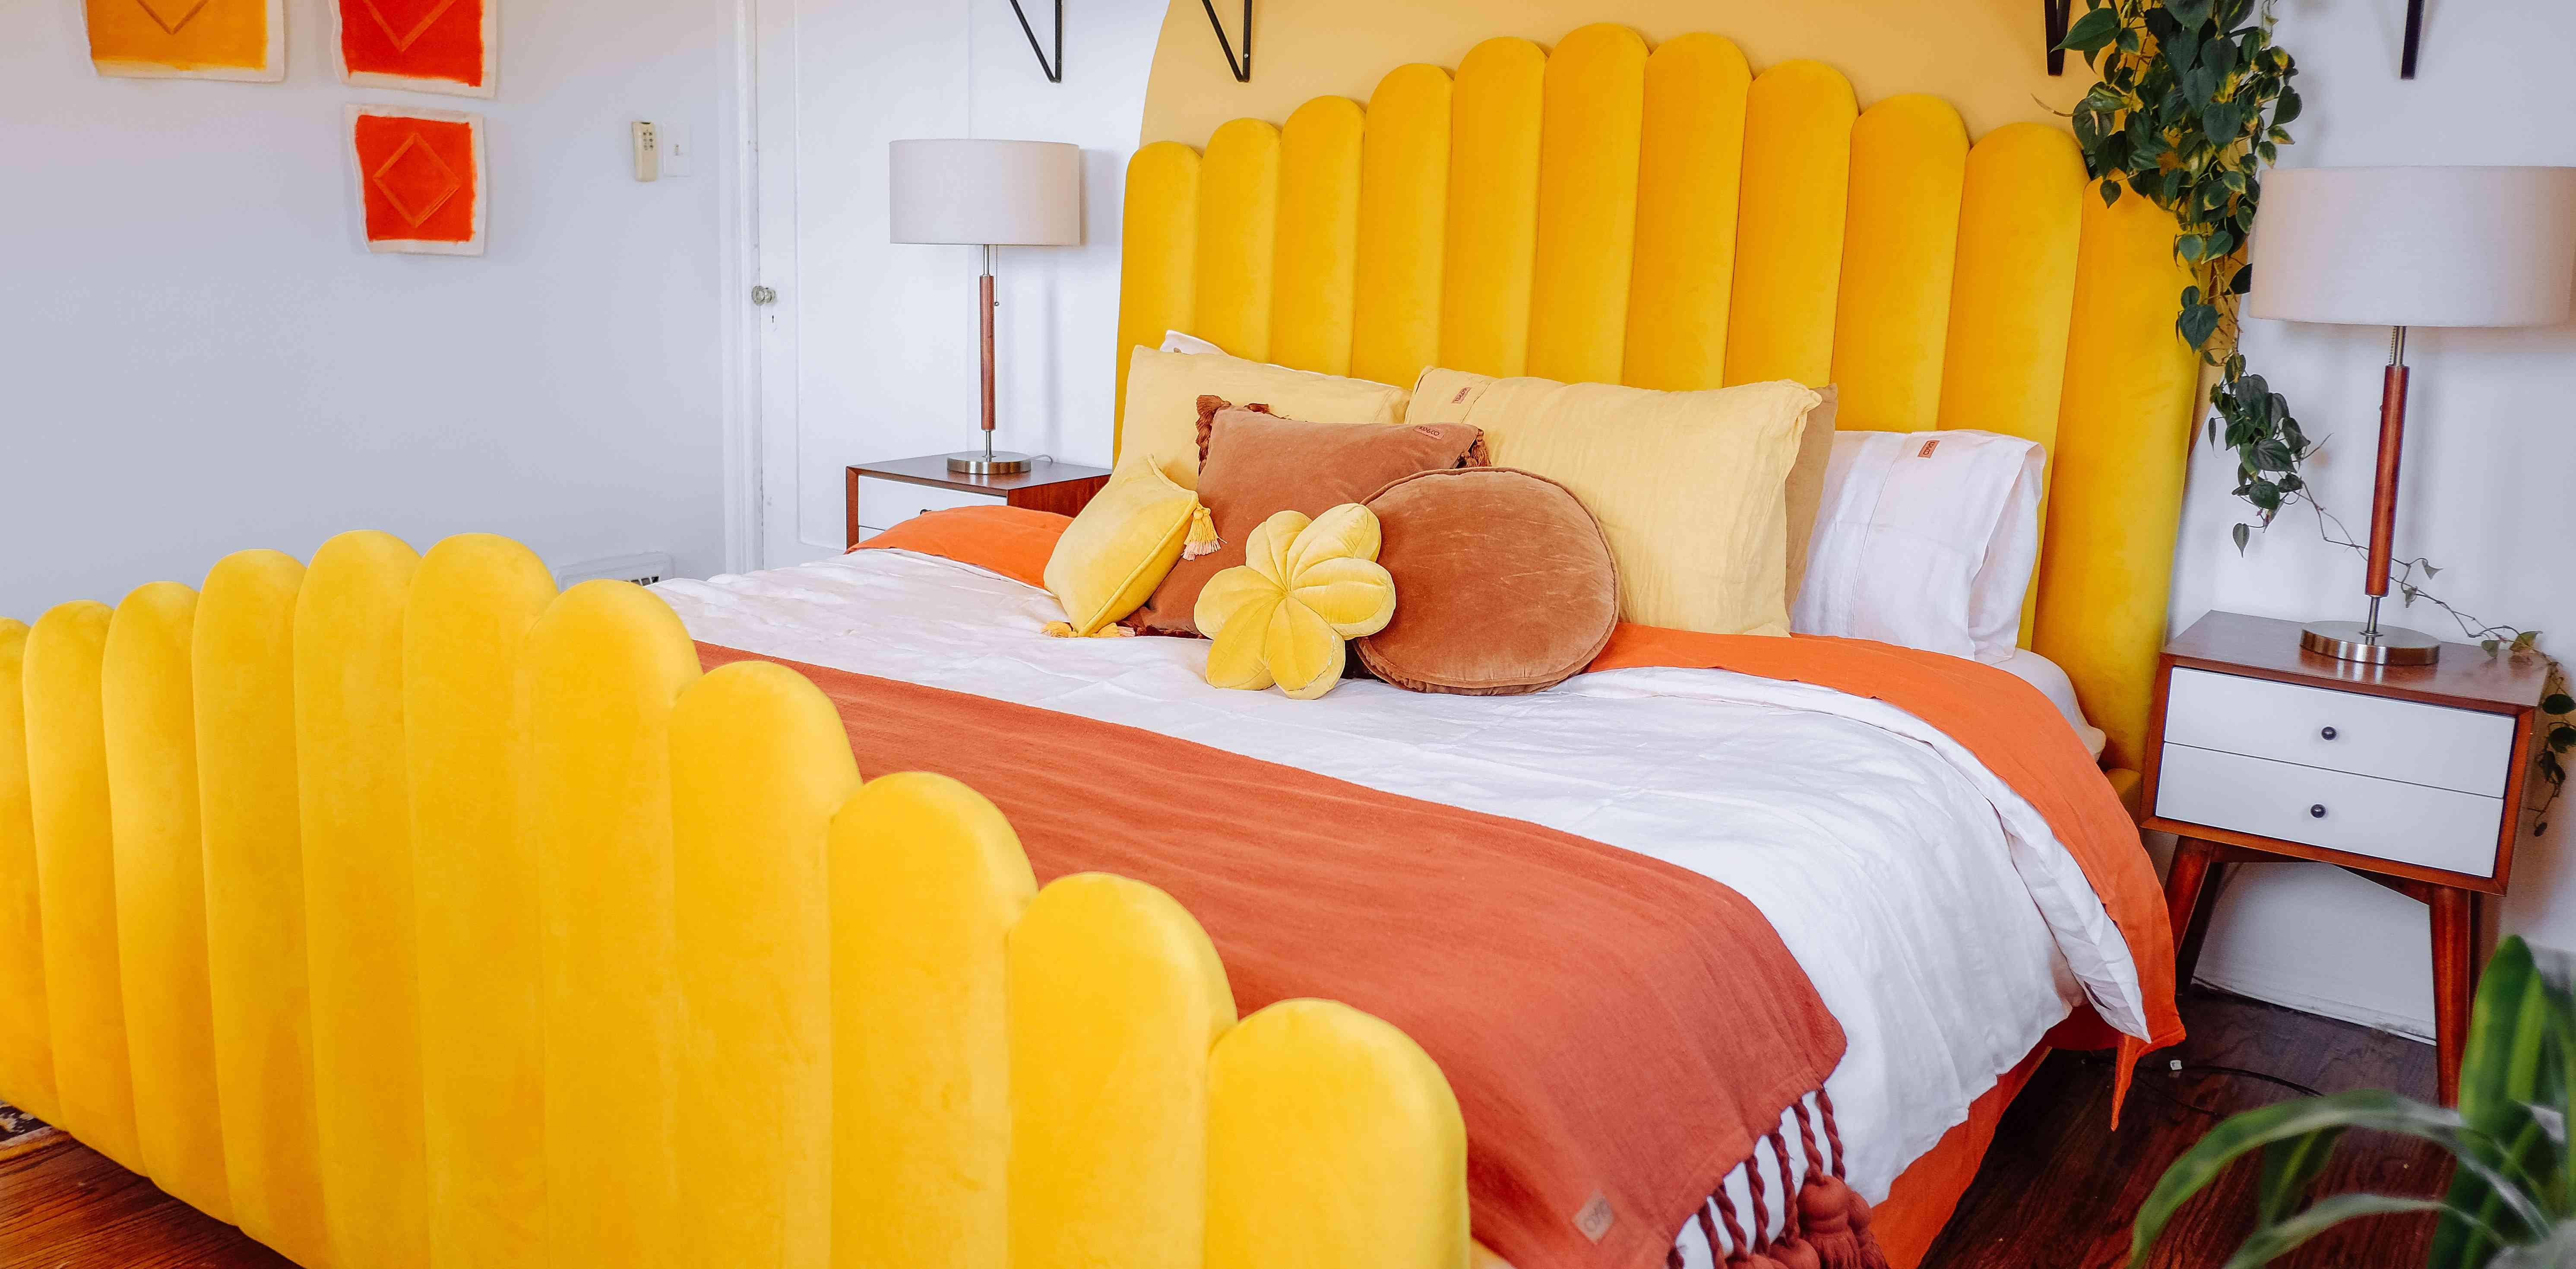 bedroom with plush yellow headboard, yellow mural, orange blankets